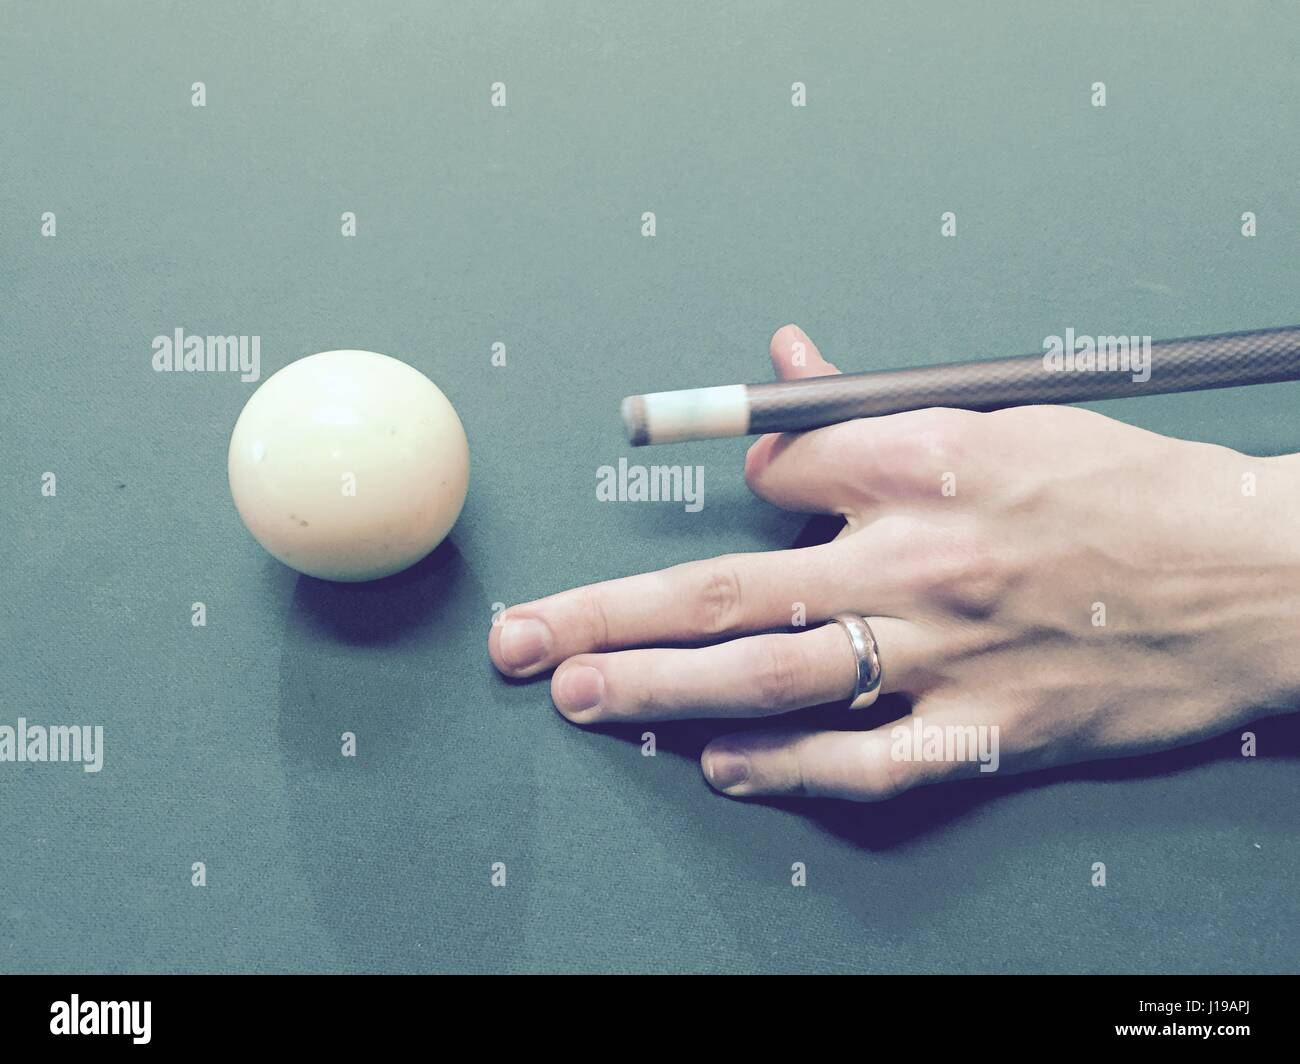 Playing Pool - Stock Image